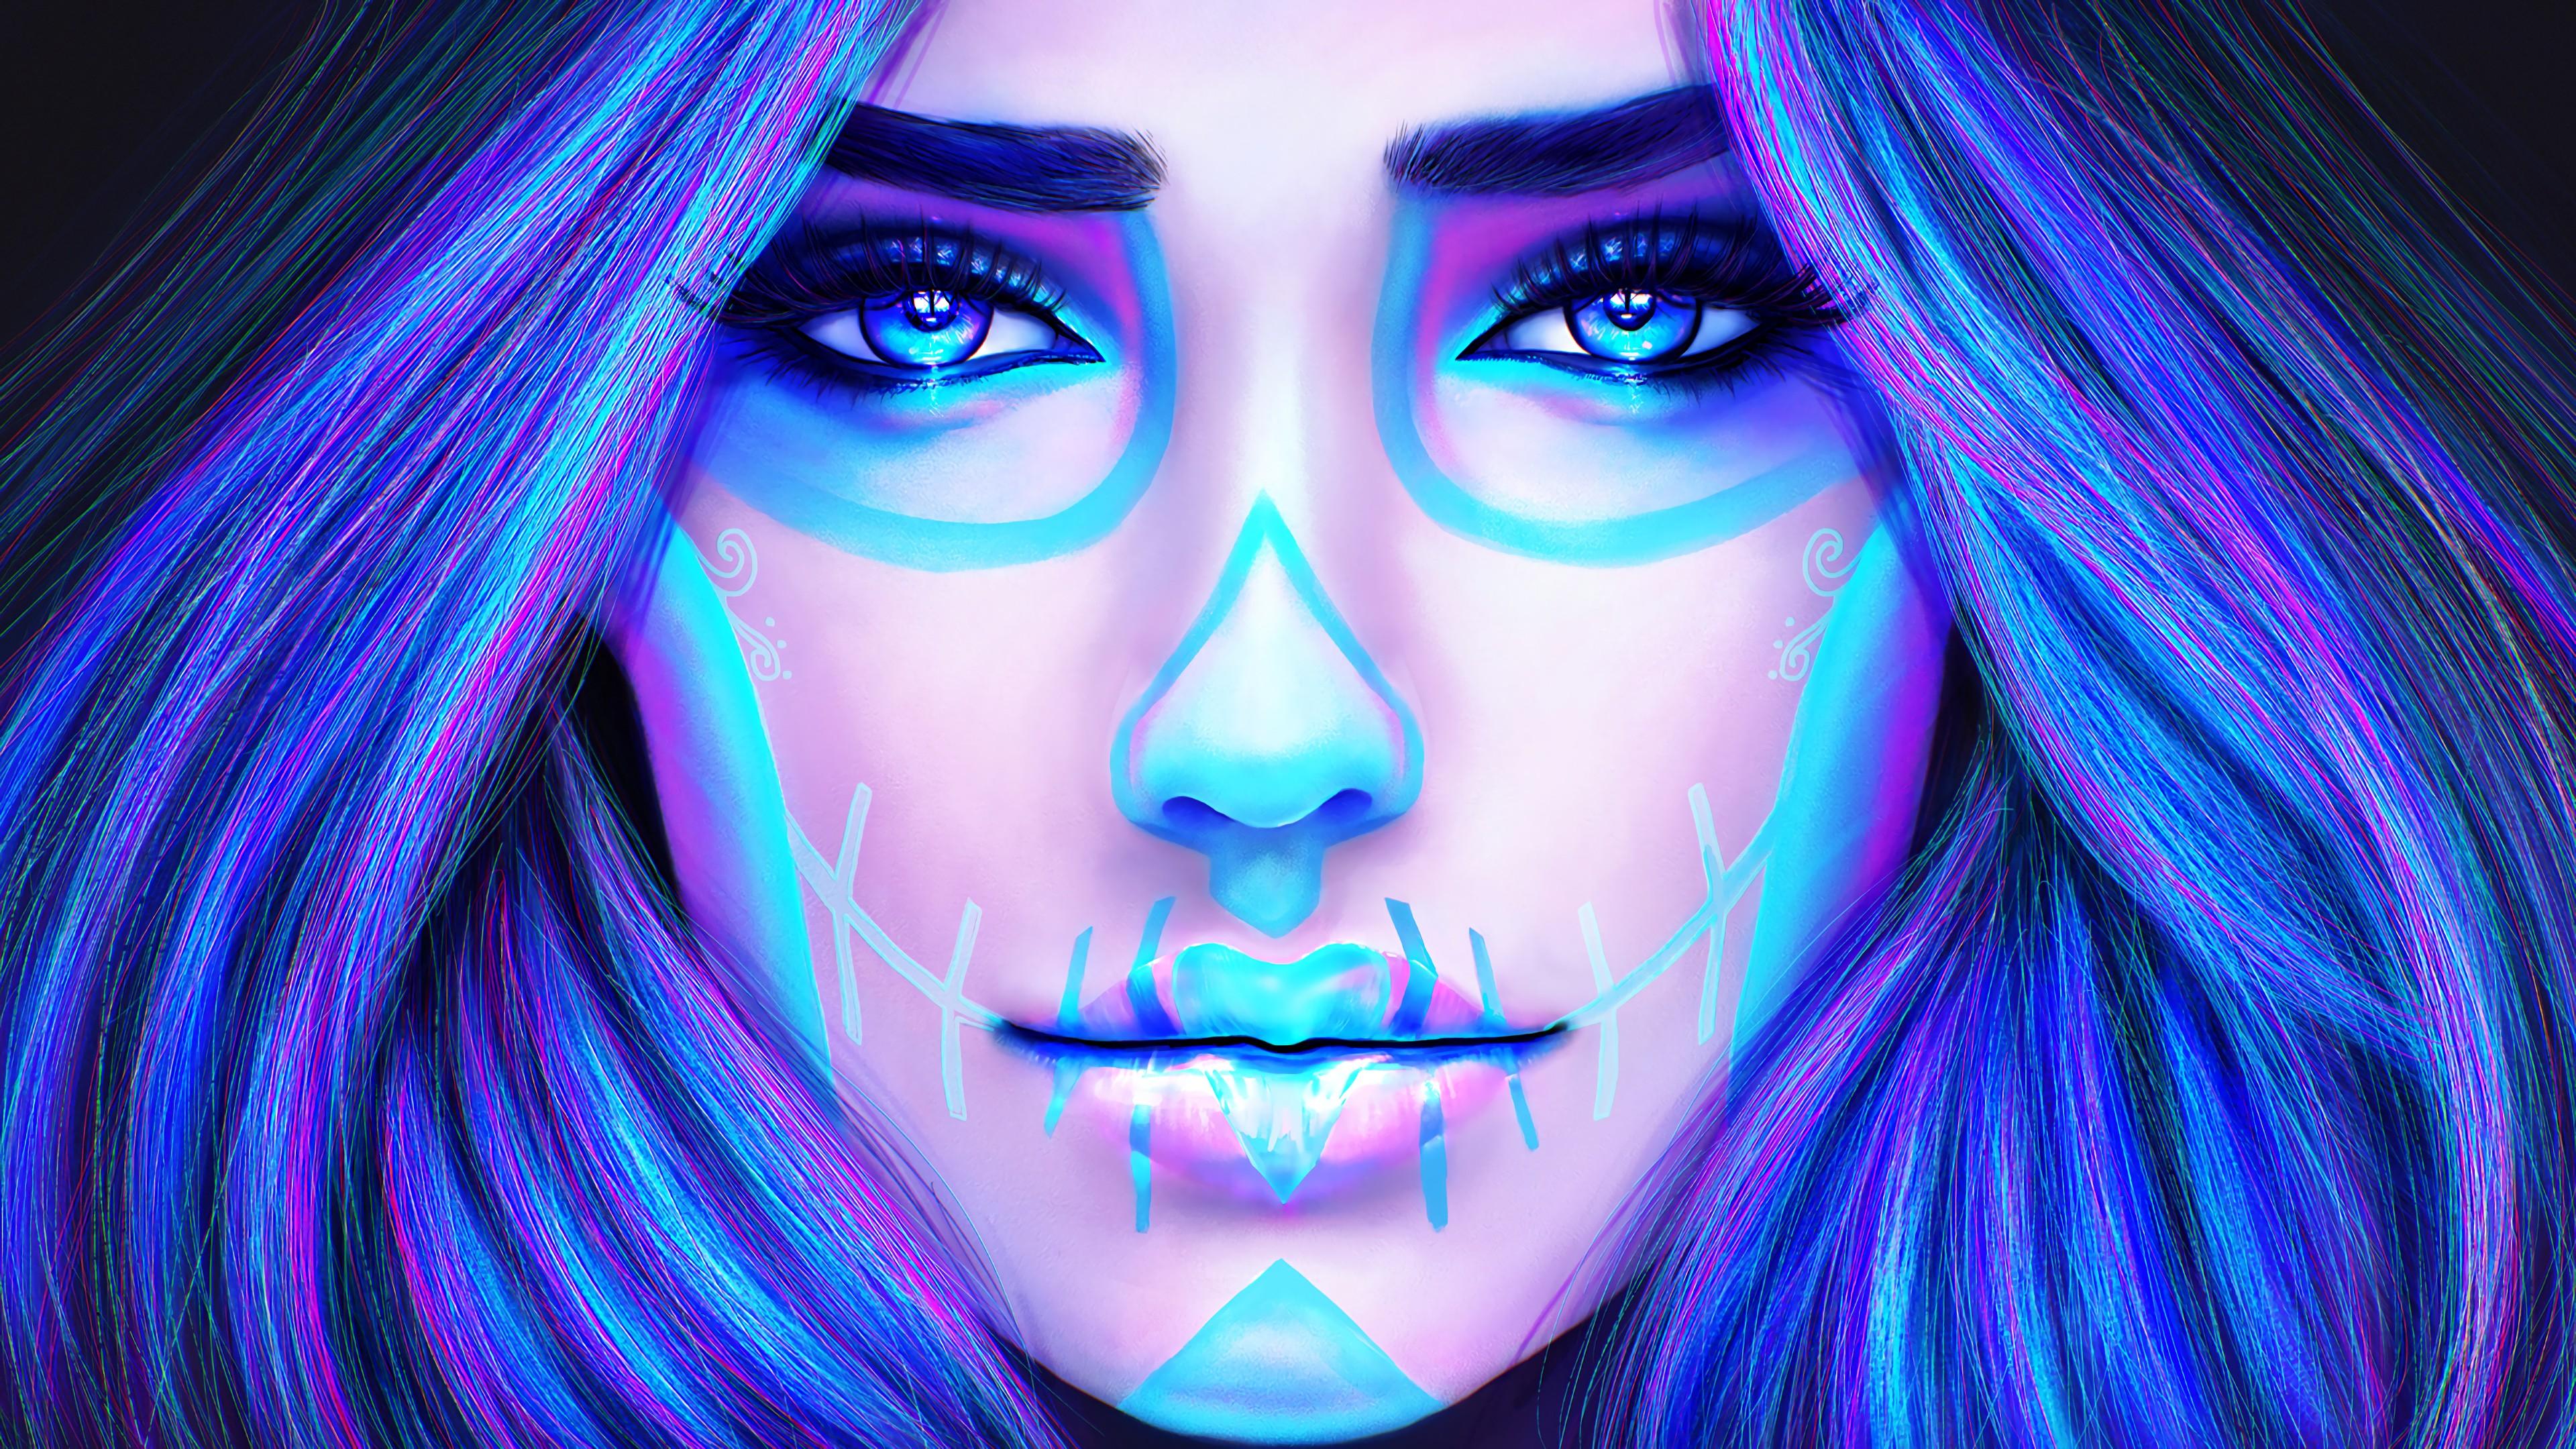 People 3840x2160 women makeup people MagicnaAnavi DeviantArt face colorful blue eyes fantasy art fantasy girl blue